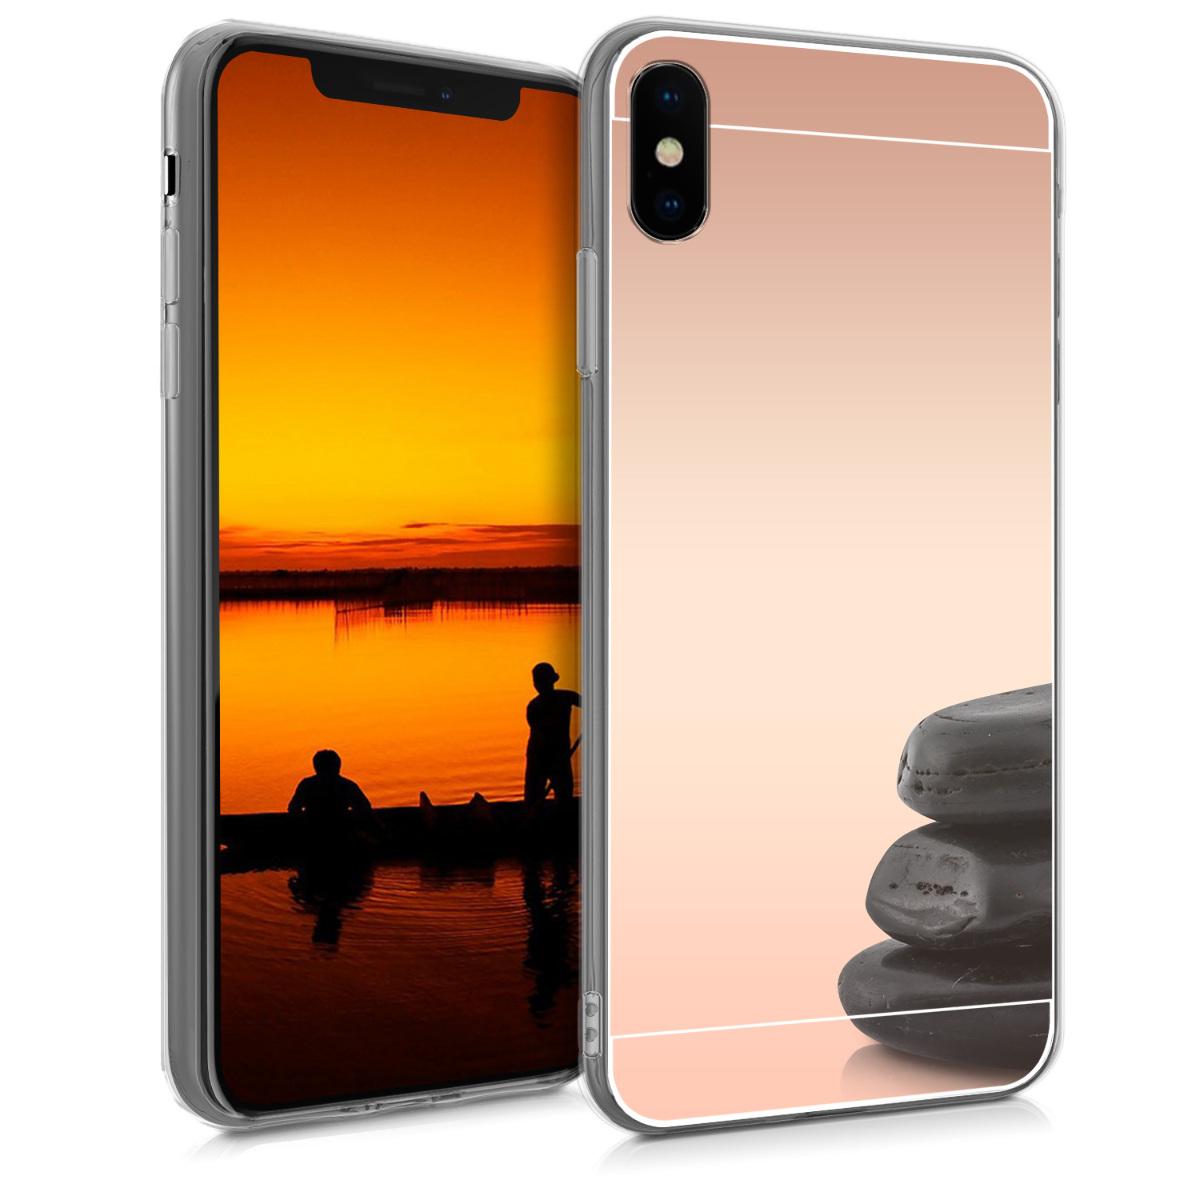 KW Θήκη Σιλικόνης (TPU) με Καθρέφτη iPhone XS Max - Rose Gold Reflective (46745.81)